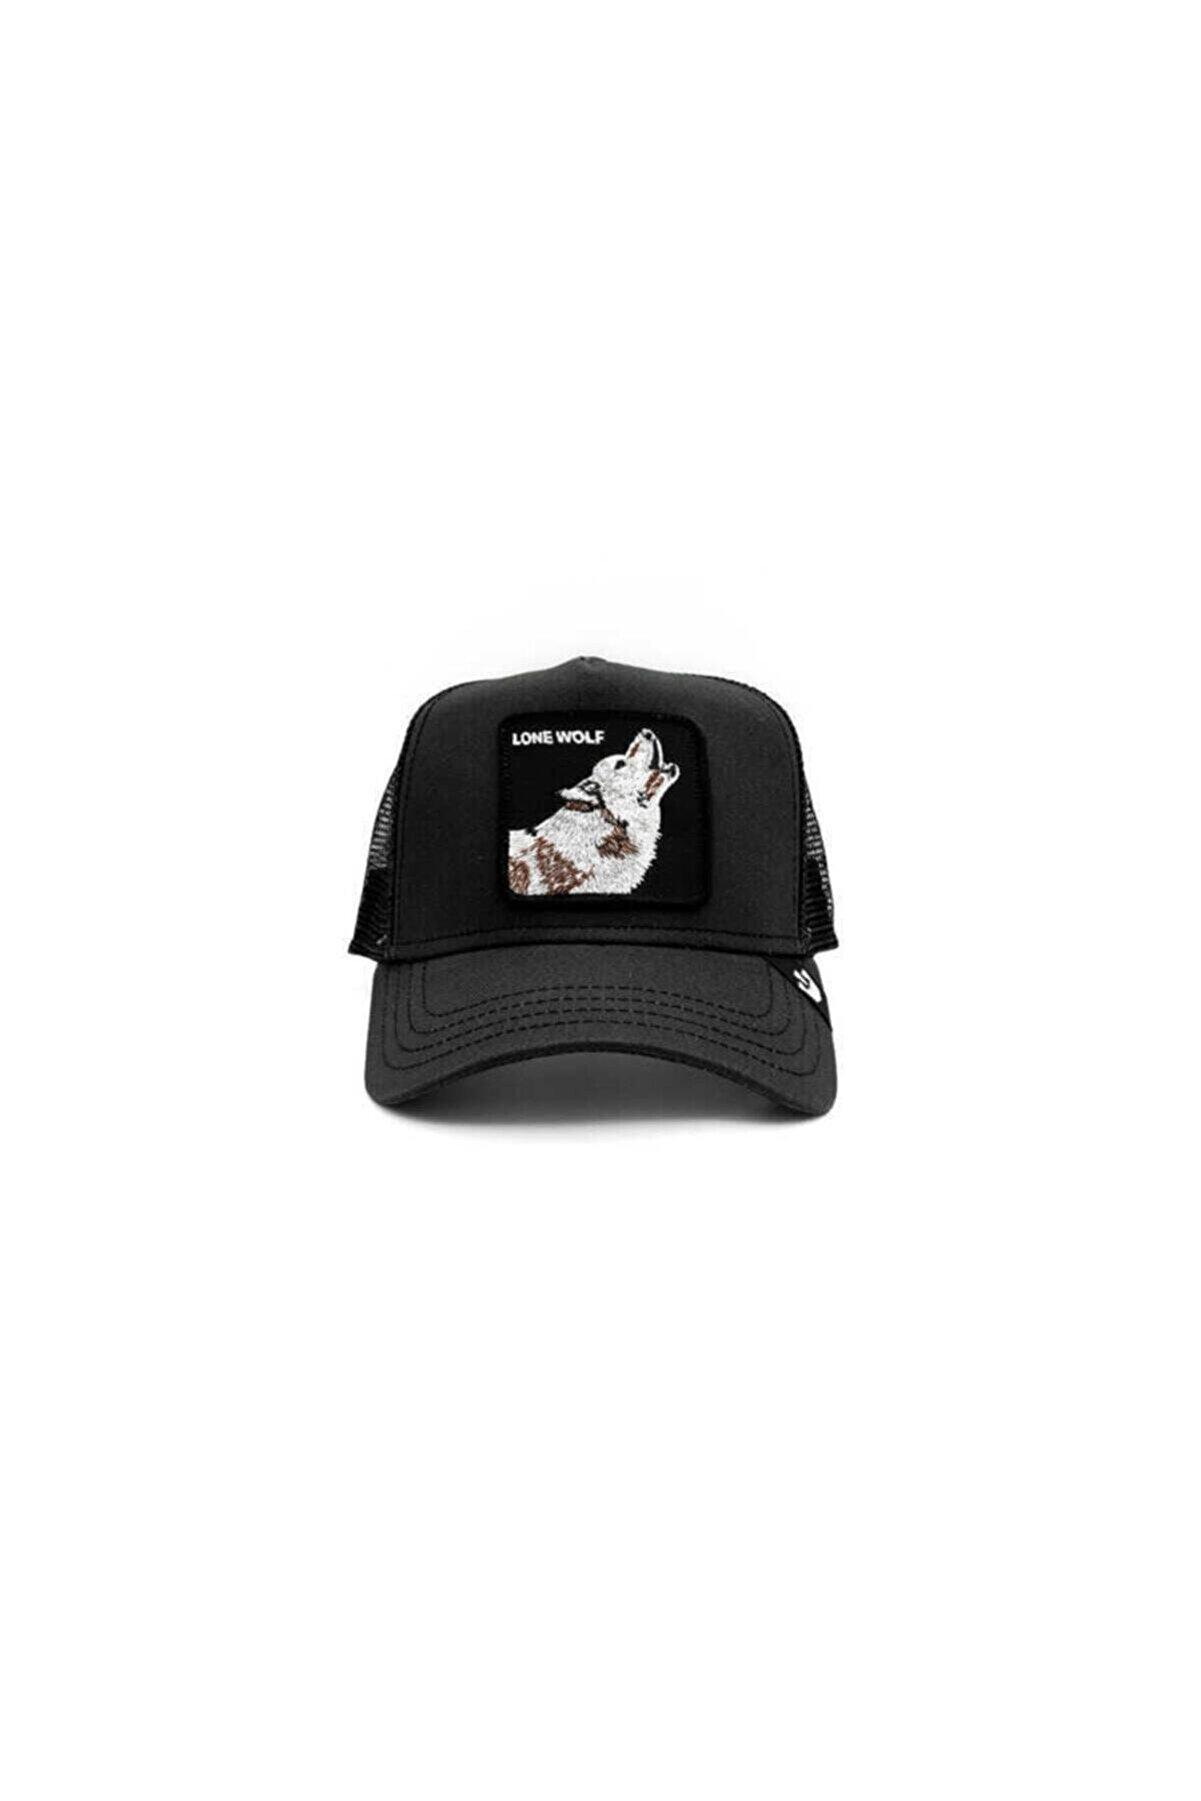 Goorin Bros Unisex Siyah Standart Moon Lover Şapka 101-0556